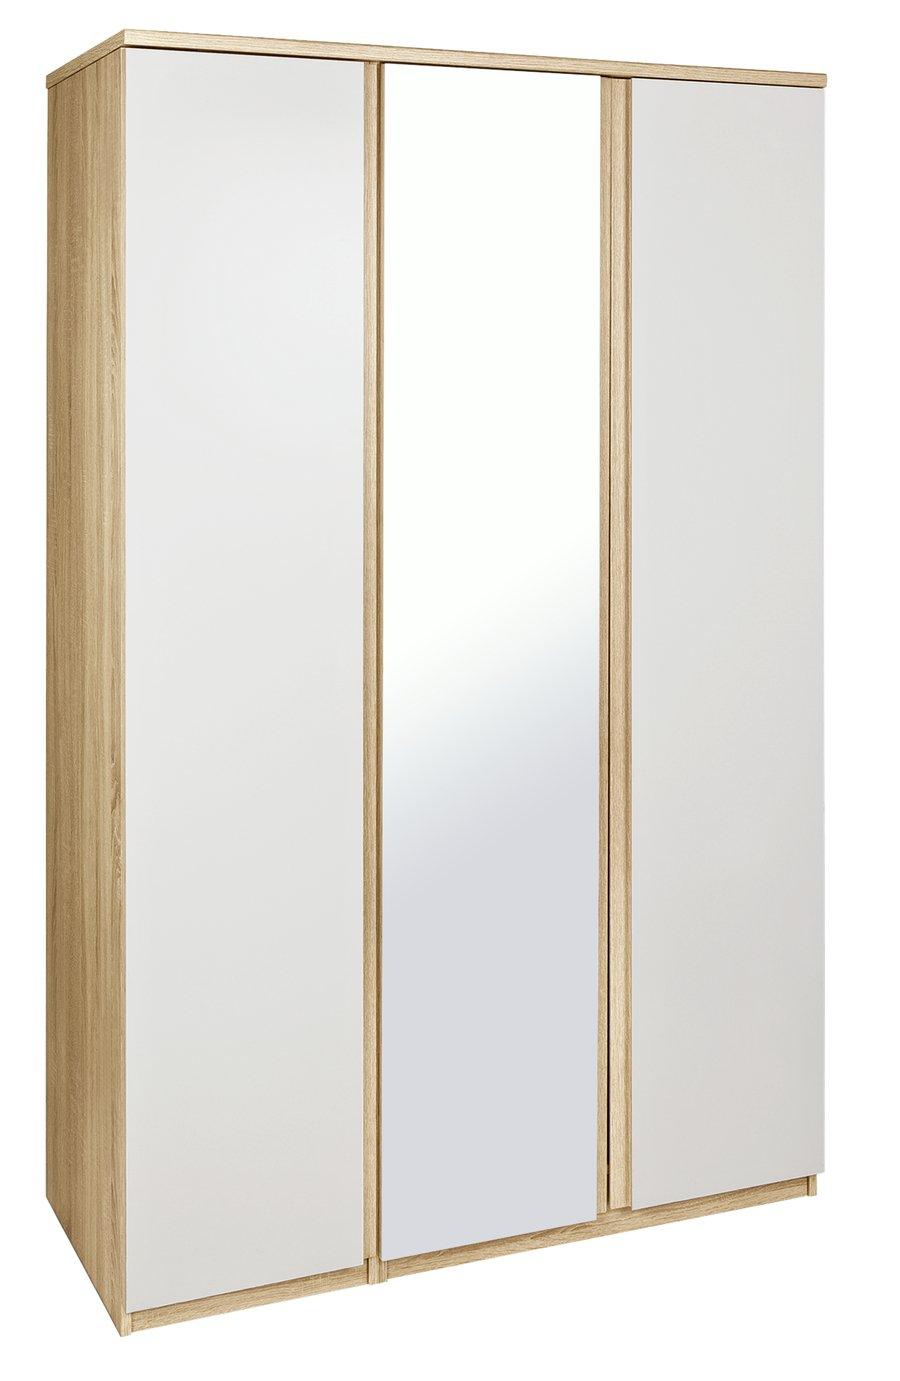 Image of Avenue 3 Door Mirrored Wardrobe - Oak Effect & White Gloss